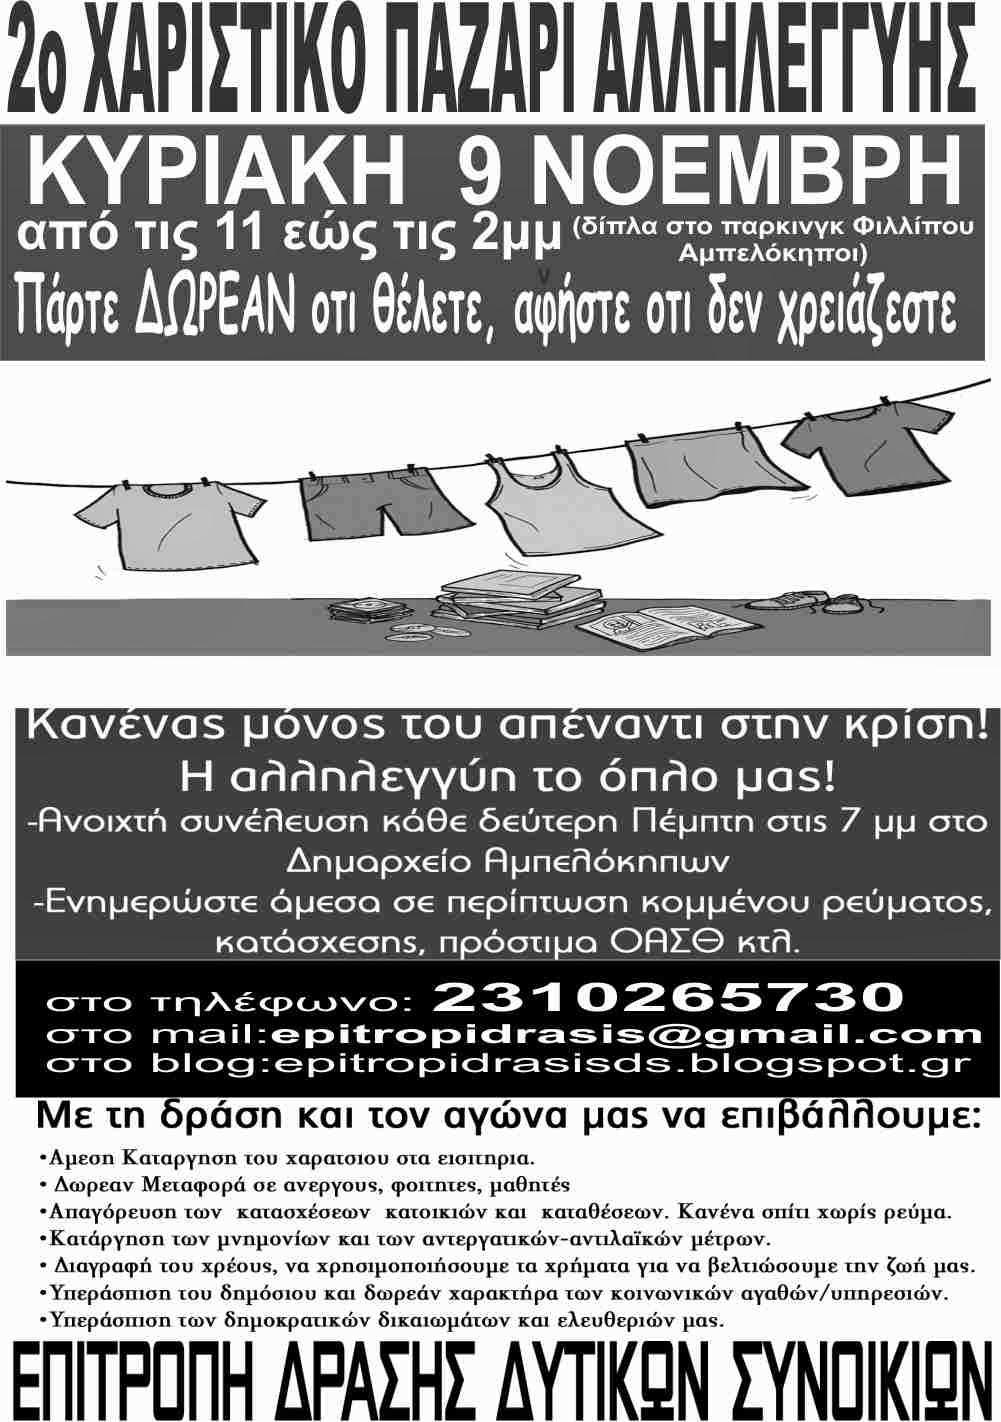 2o ΧΑΡΙΣΤΙΚΟ ΠΑΖΑΡΙ ΑΛΛΗΛΕΓΓΥΗΣ